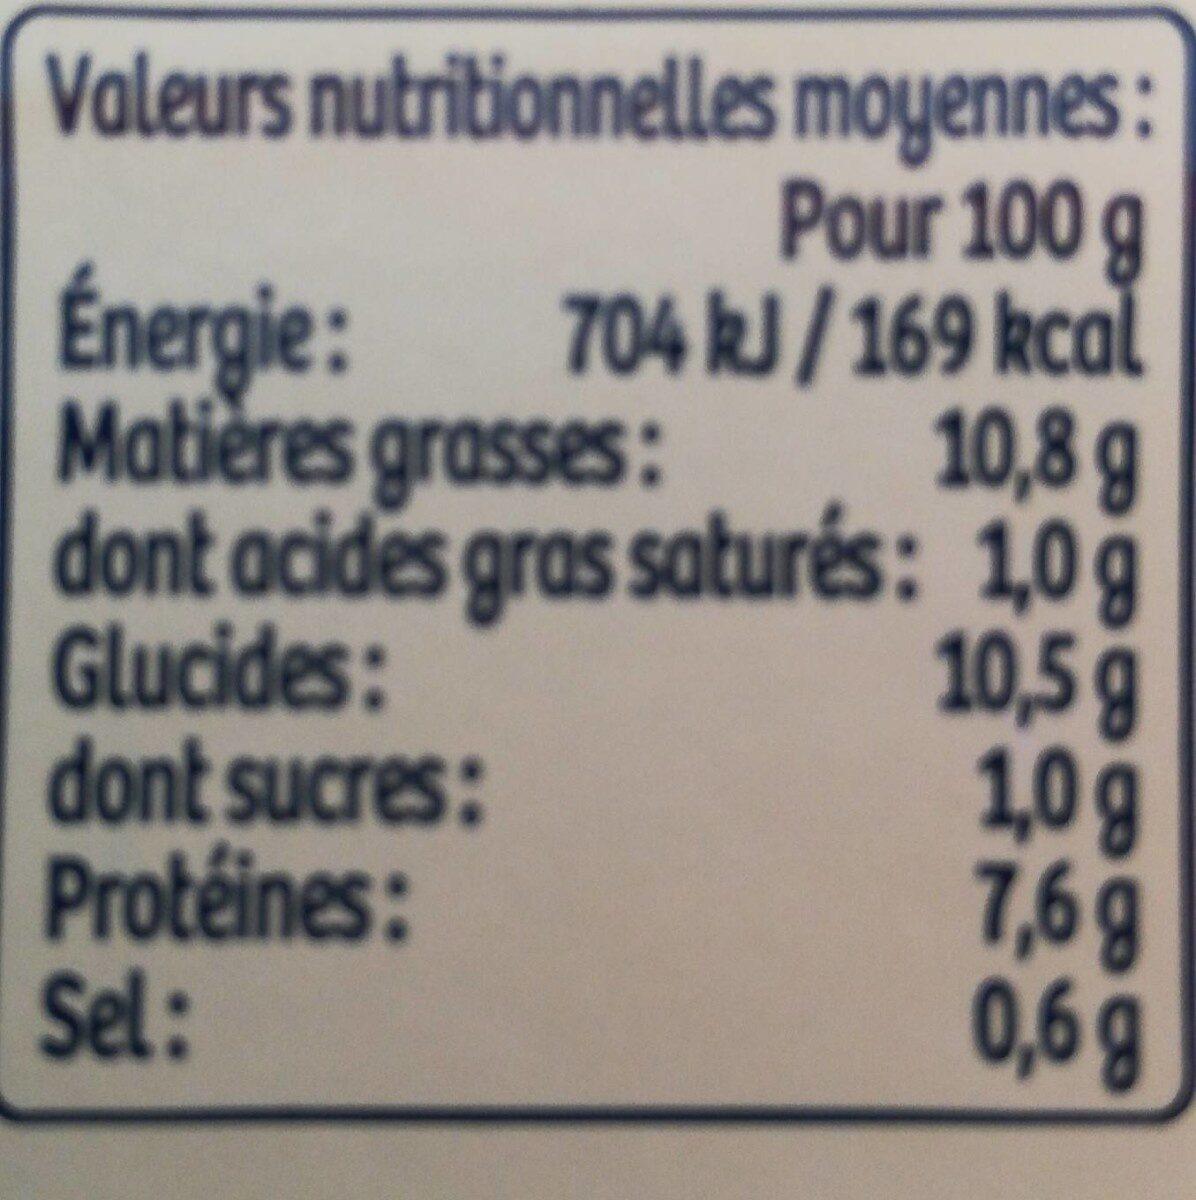 Brandade de morue - Informations nutritionnelles - fr